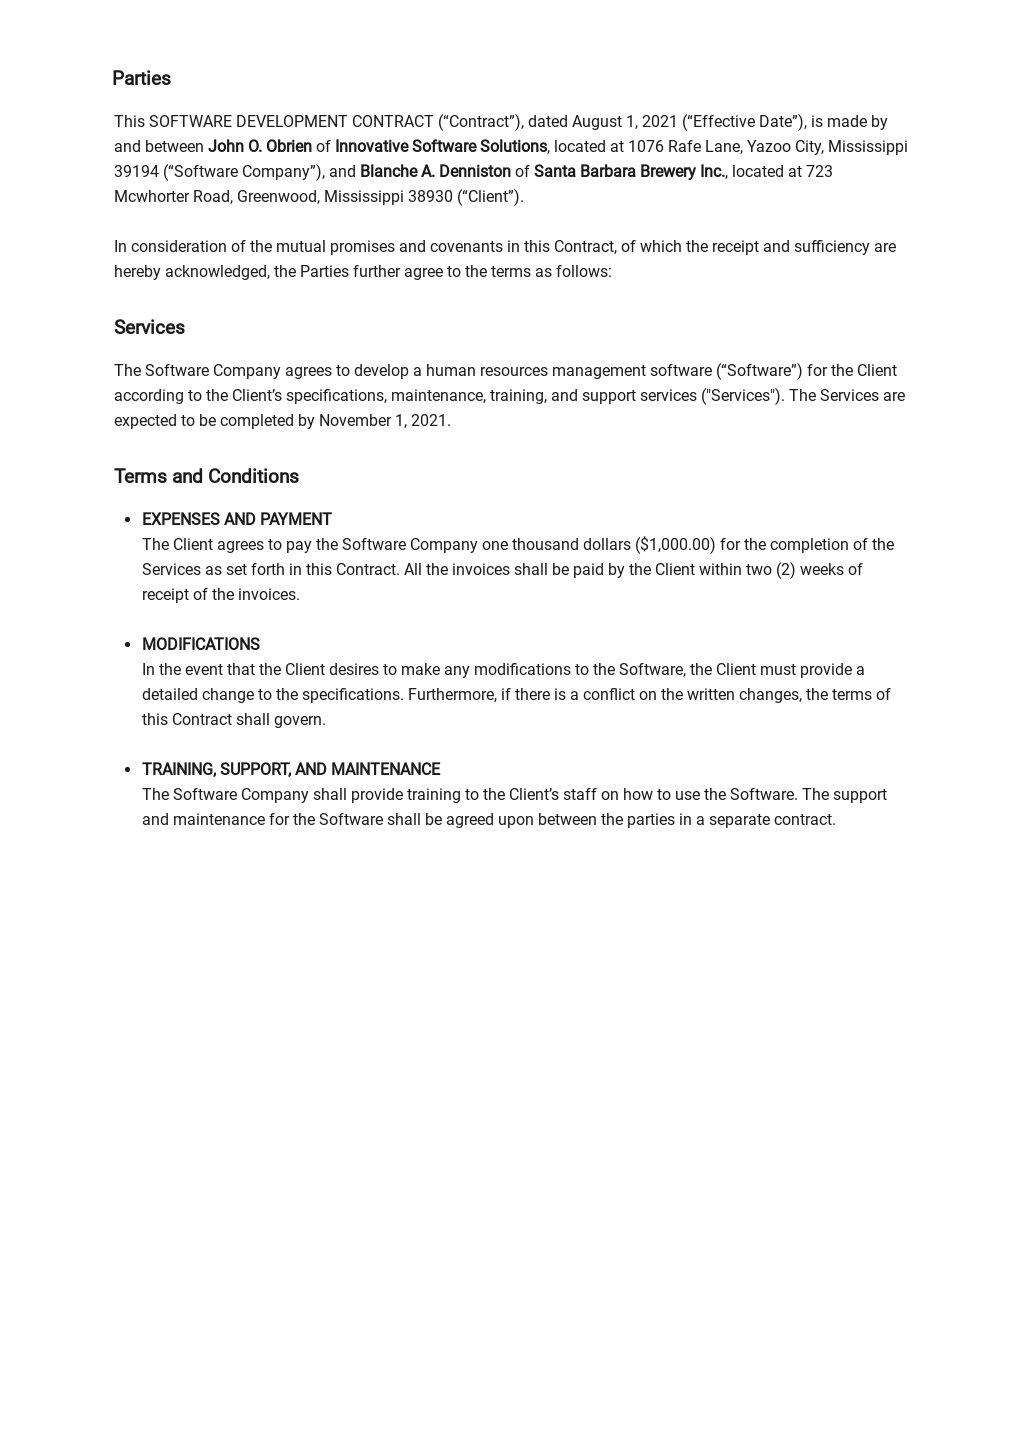 Software Development Contract Template 1.jpe